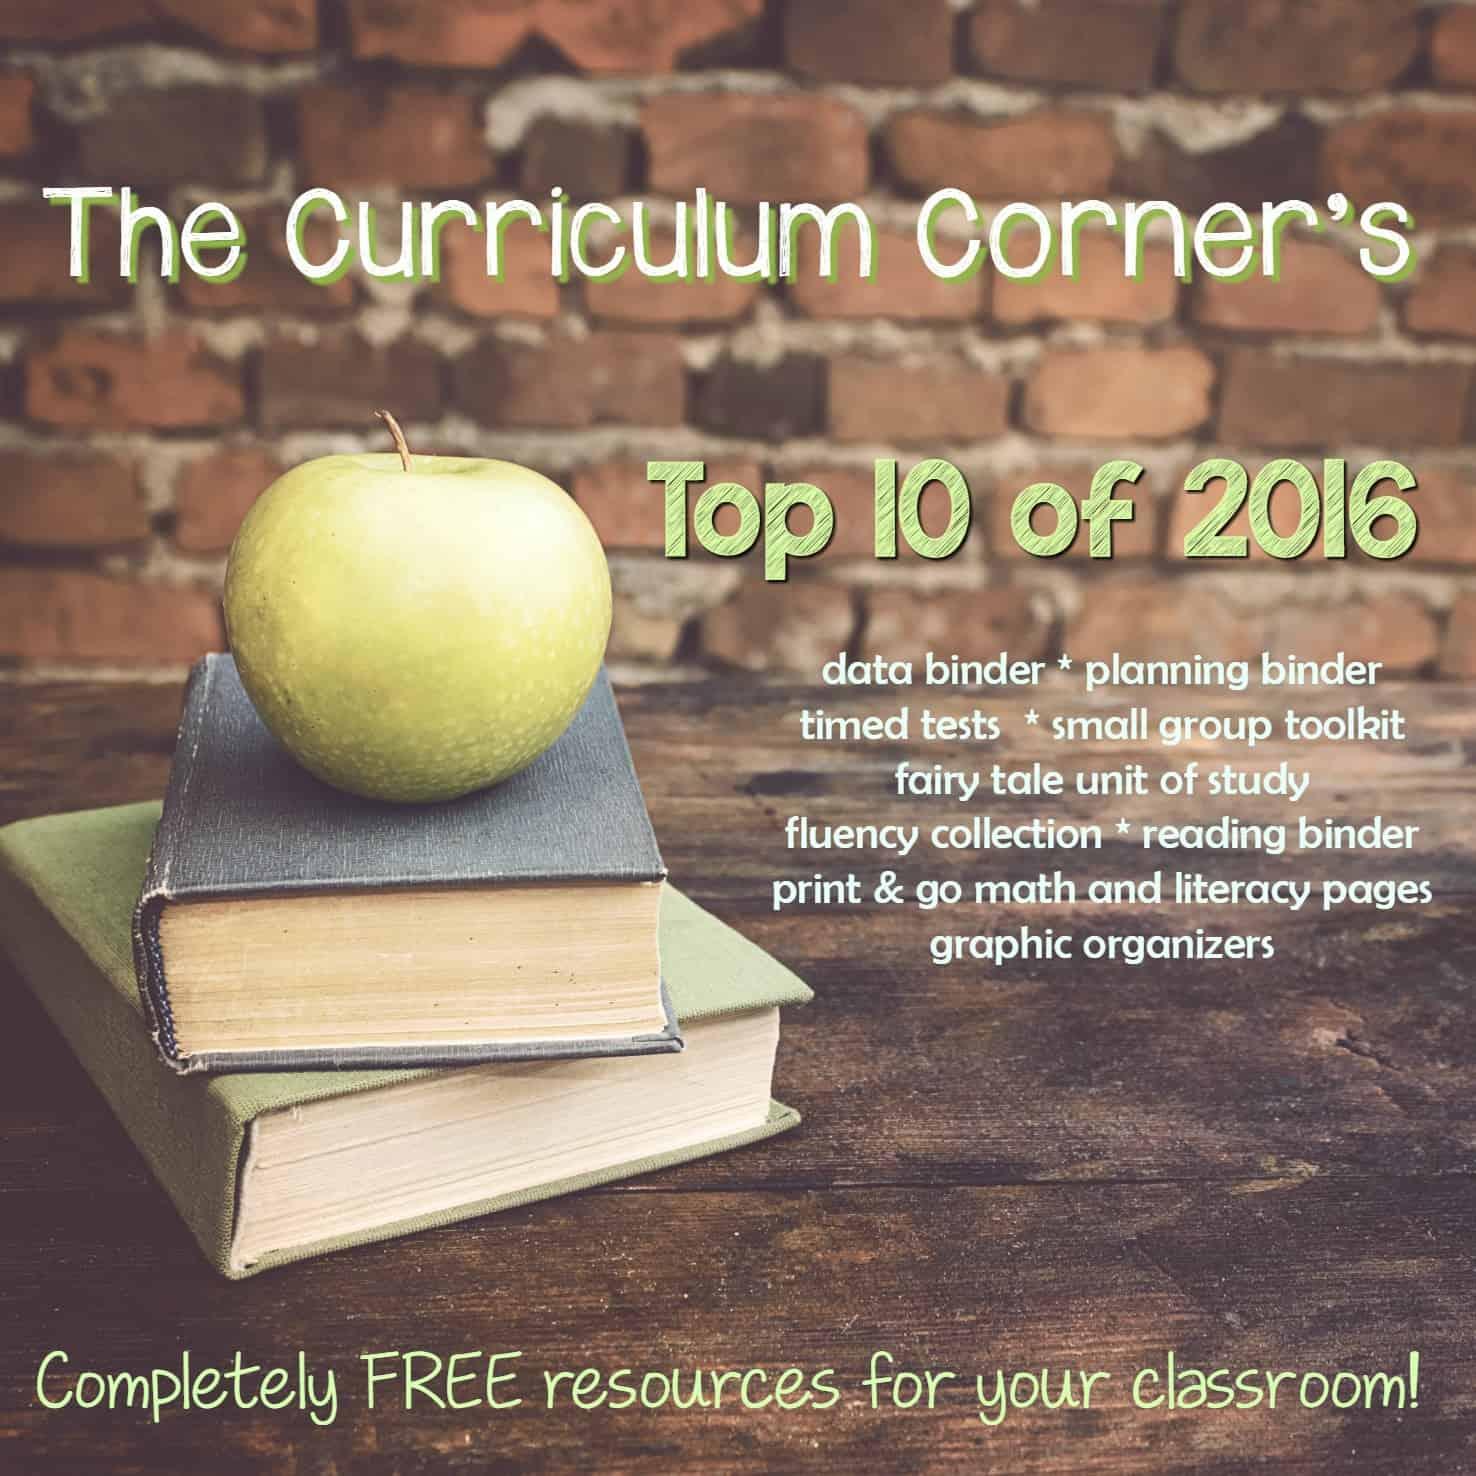 The Curriculum Corner's Top 10 of 2016